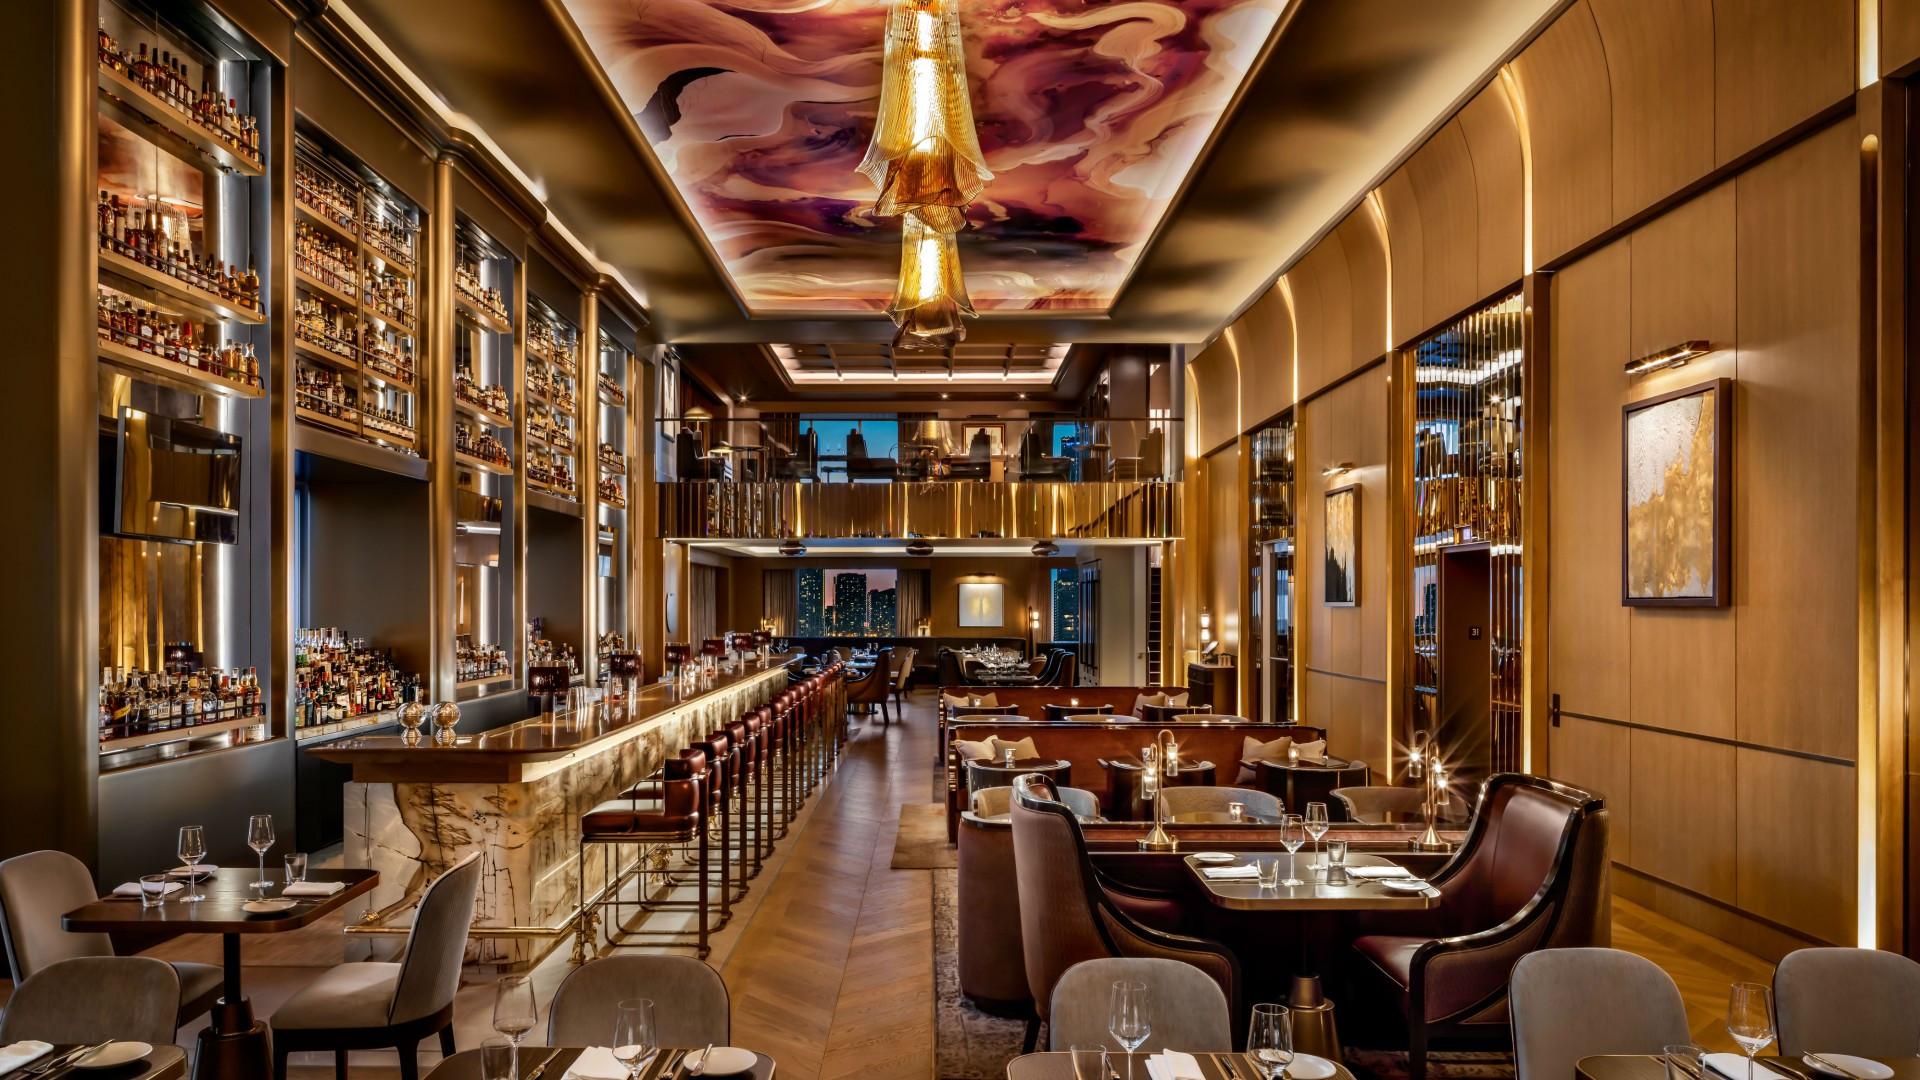 Best hotels Toronto staycation | The St. Regis Hotel lobby bar and restaurant